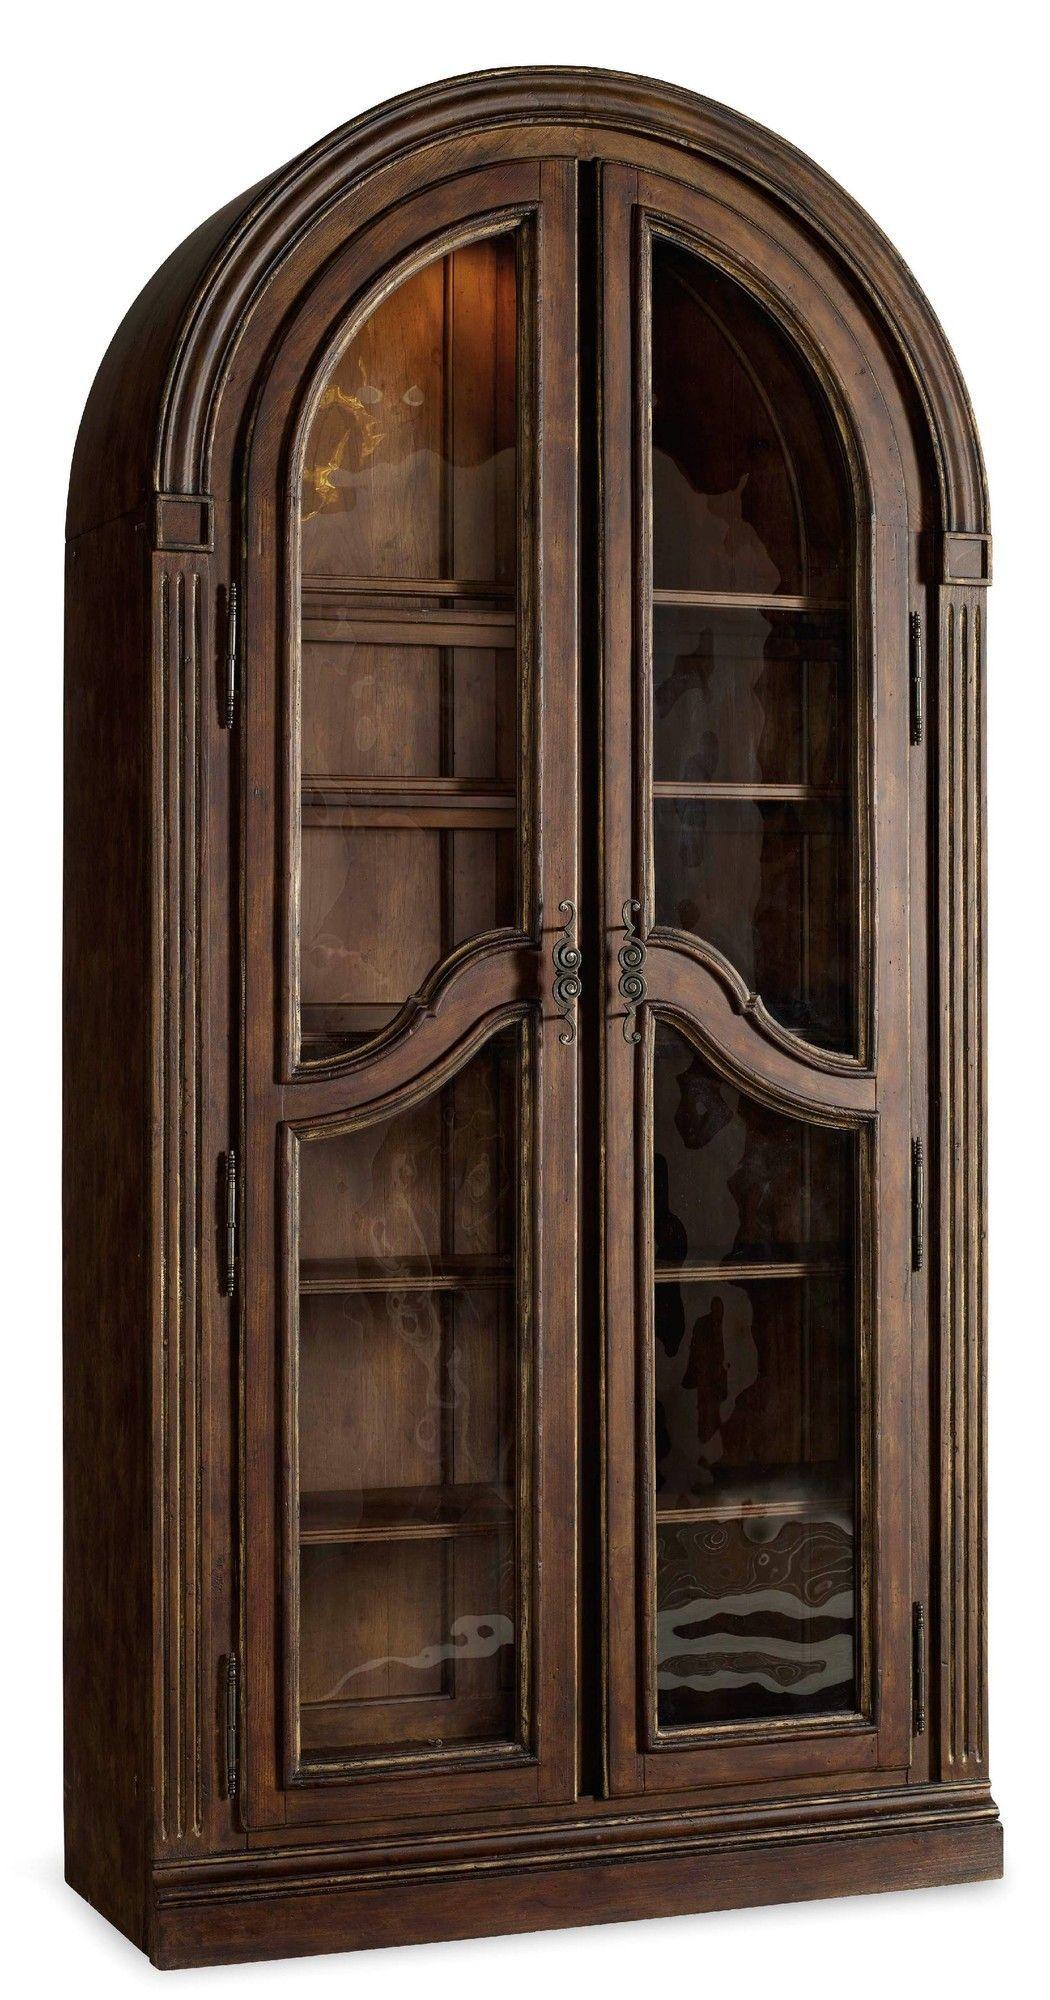 Vintage Furniture Glass Living Room Showcase Design Wood: Features: -Top Two Shelves Are Adjustable Wood-framed